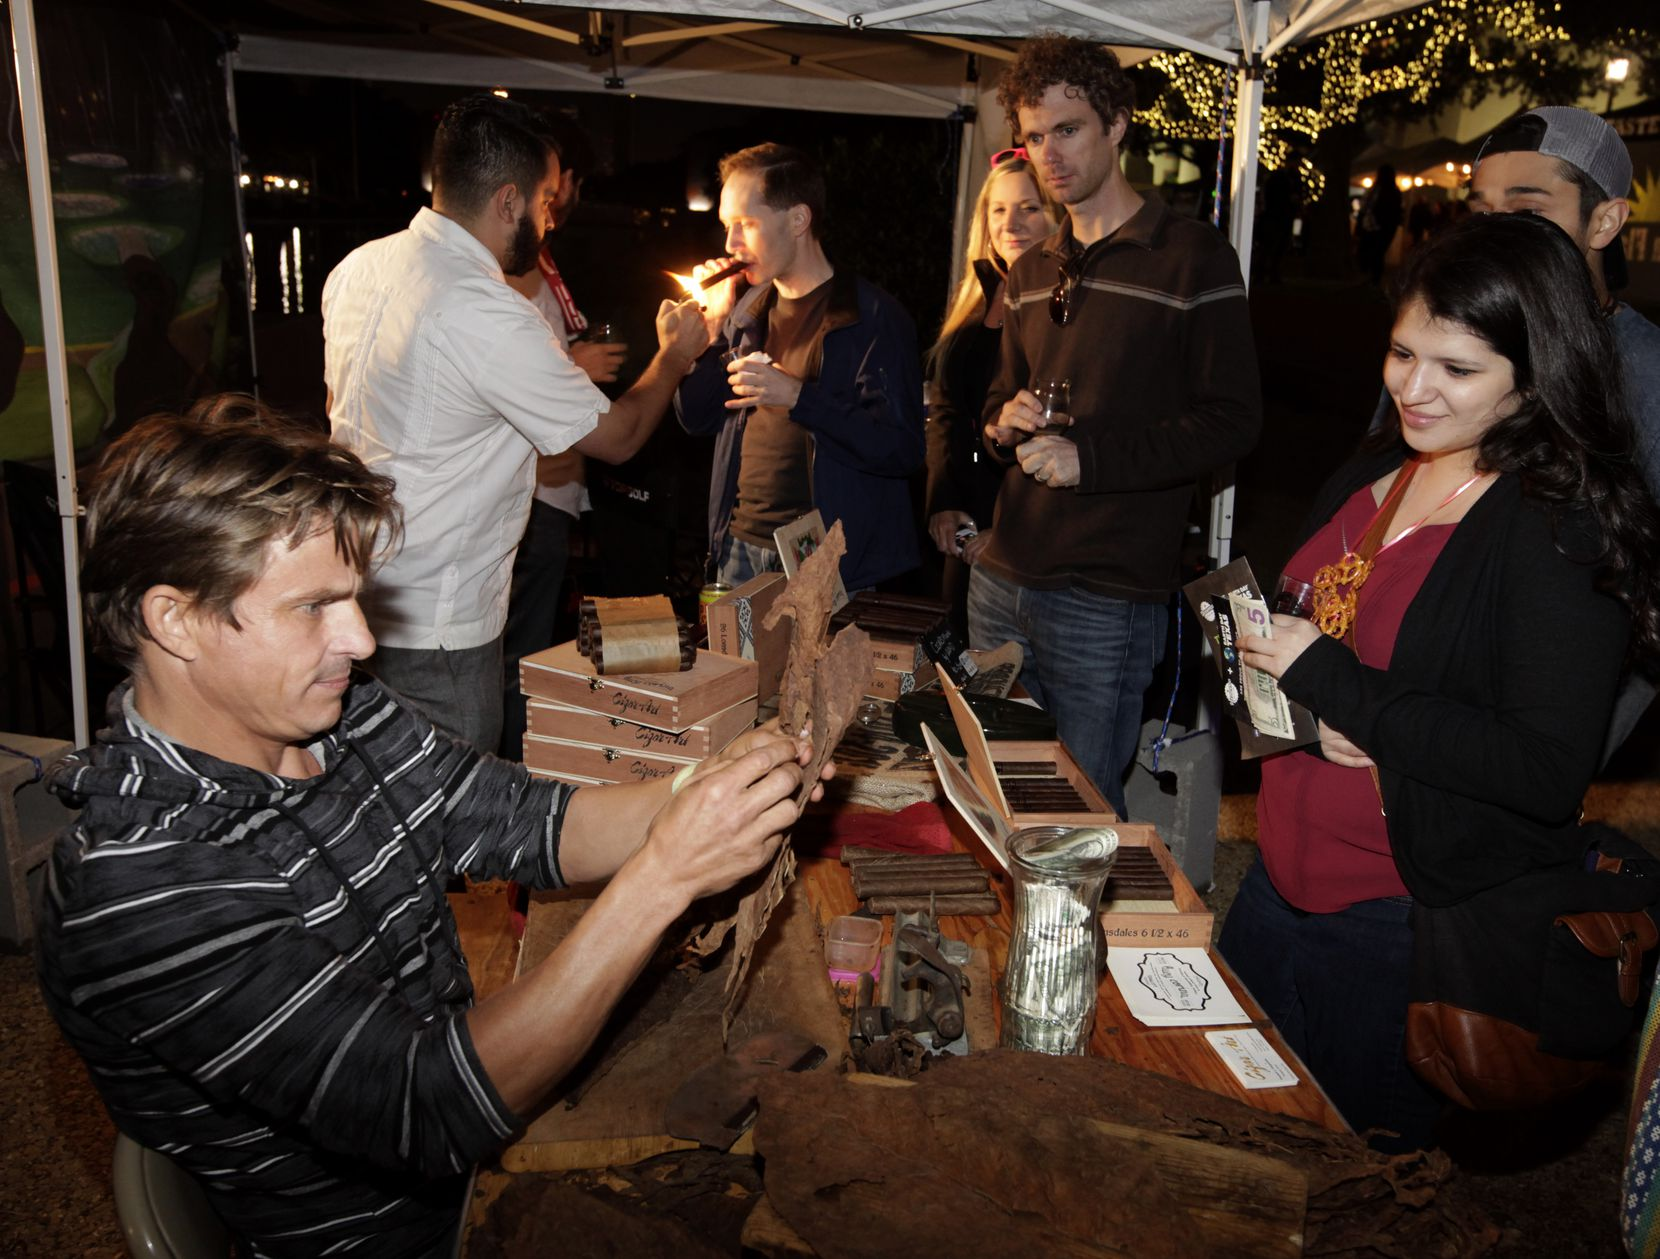 Yordy Mendez, left, rolls cigars. (Jason Janik/Special Contributor)